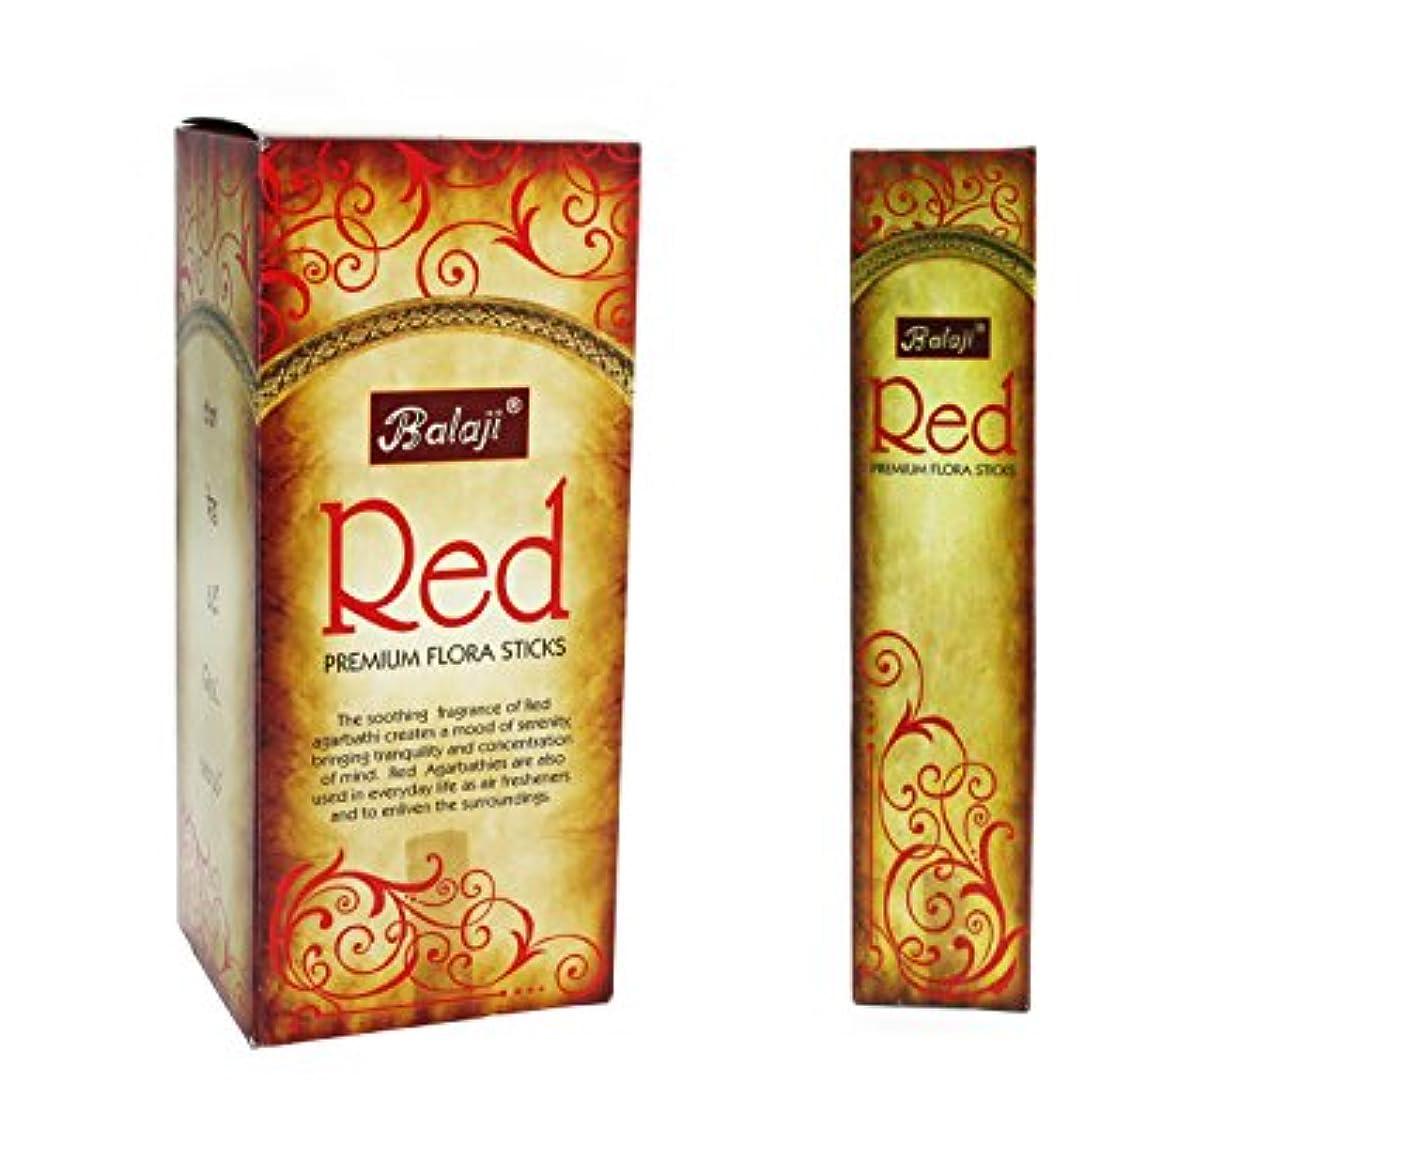 構成員ブリッジ協力的Balaji Red Premium Flora Sticks (Incense/Joss Sticks/ Agarbatti) (12 units x 15 Sticks) by Balaji